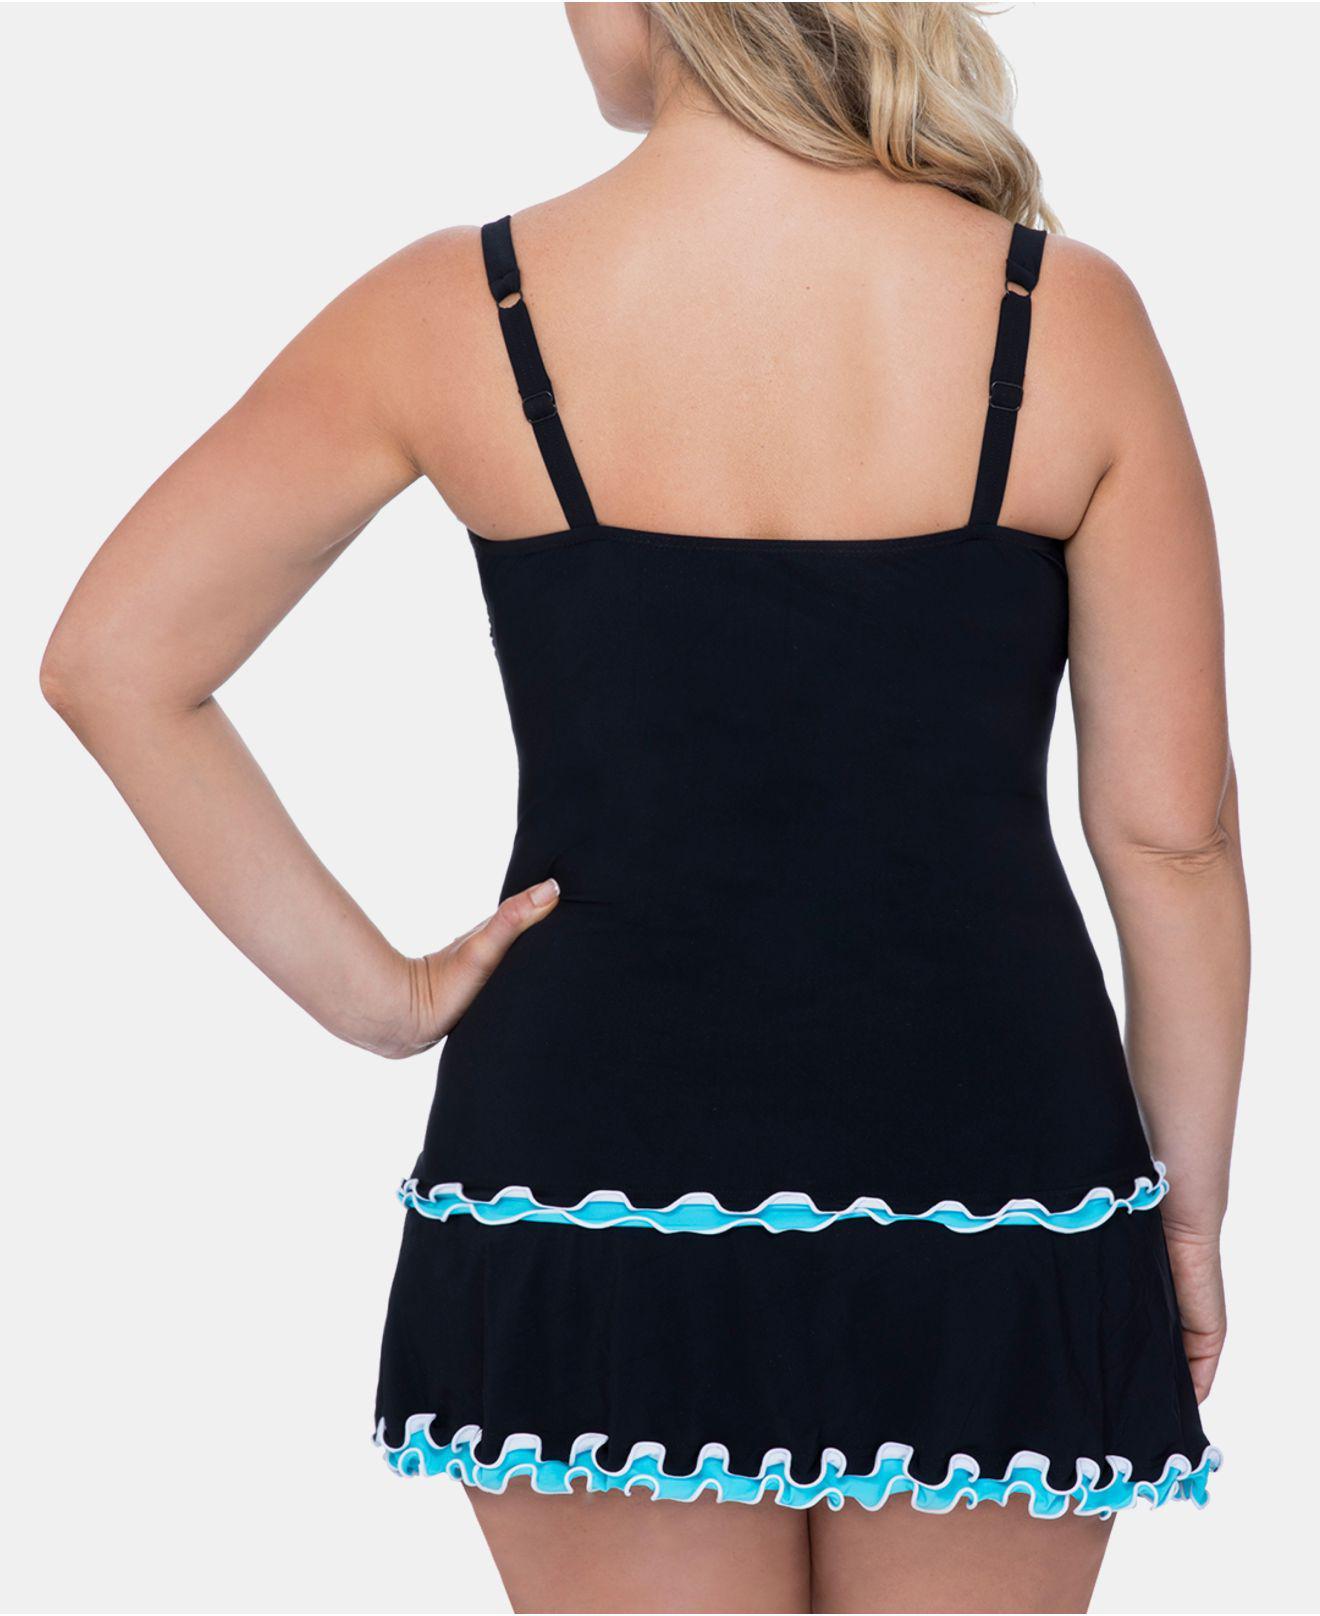 8ff2114a97f Lyst - Gottex Plus Size Tutti Frutti Tankini Top in Black